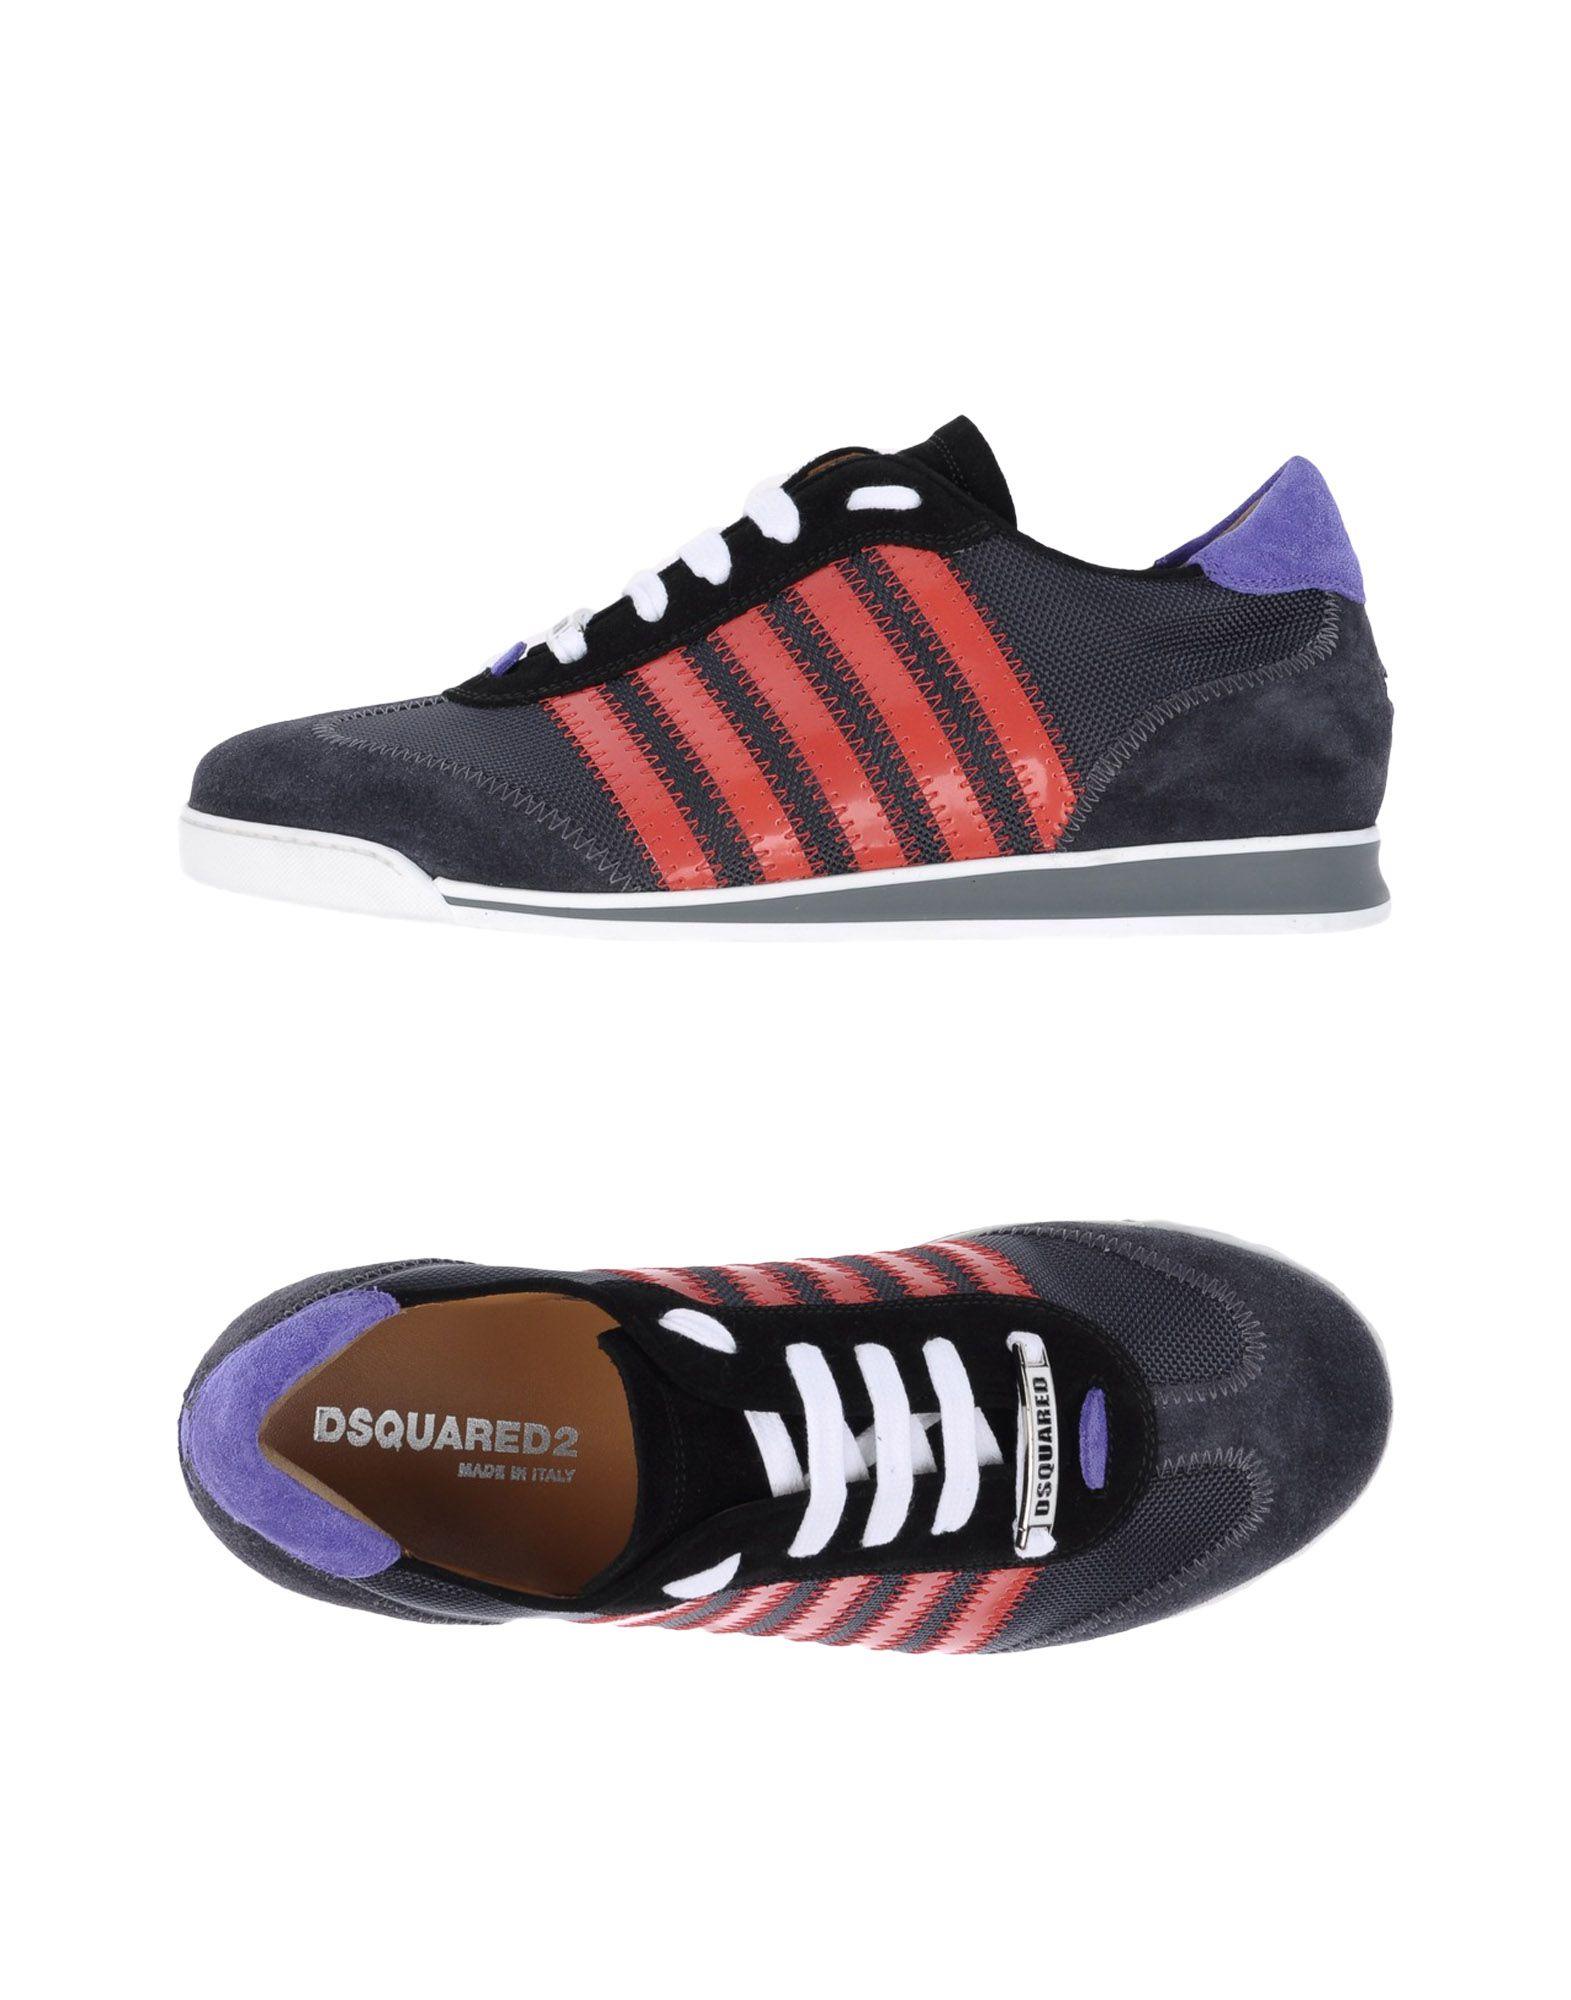 Dsquared2 Gute Sneakers Herren  11217575RF Gute Dsquared2 Qualität beliebte Schuhe f52fd4